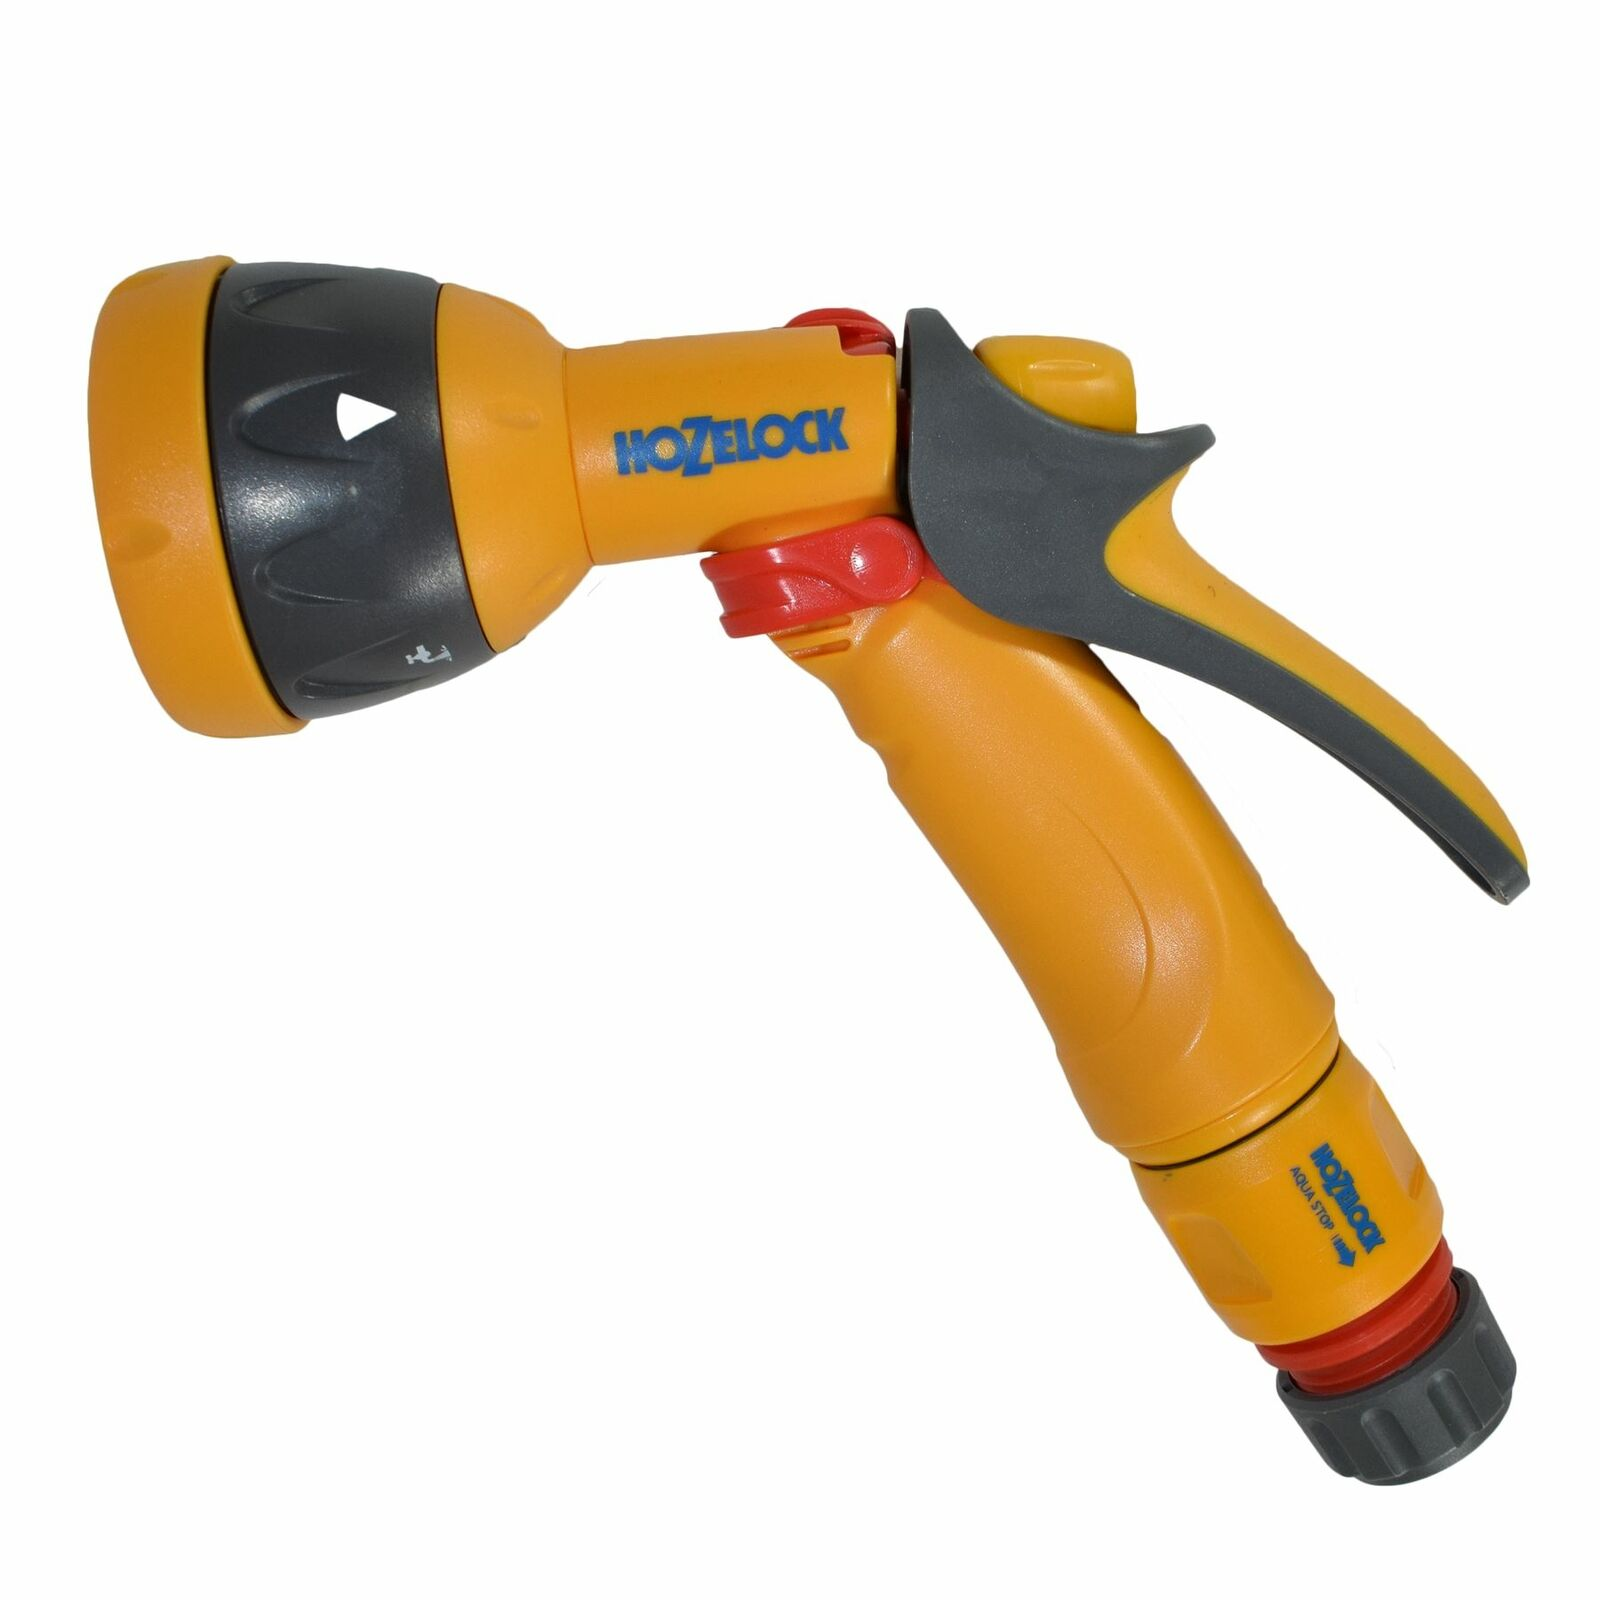 Hozelock Spray Nozzle Garden Hose Pipe Water Gun 5 Function & Aqua Stop Fitting